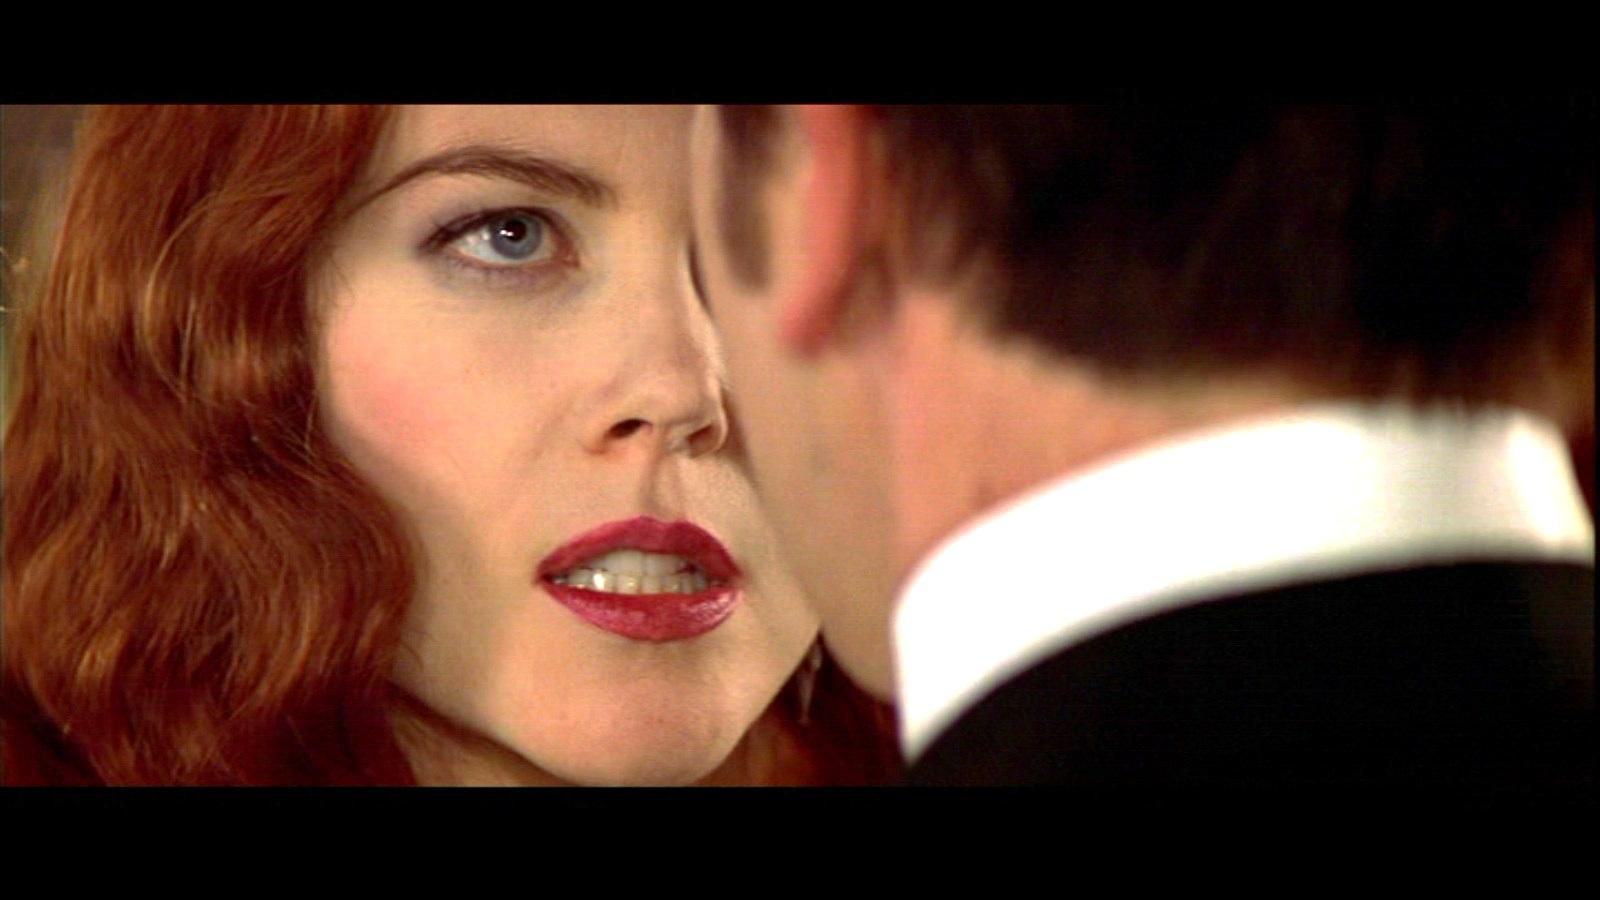 Moulin-Rouge-nicole-kidman-750615_1600_900